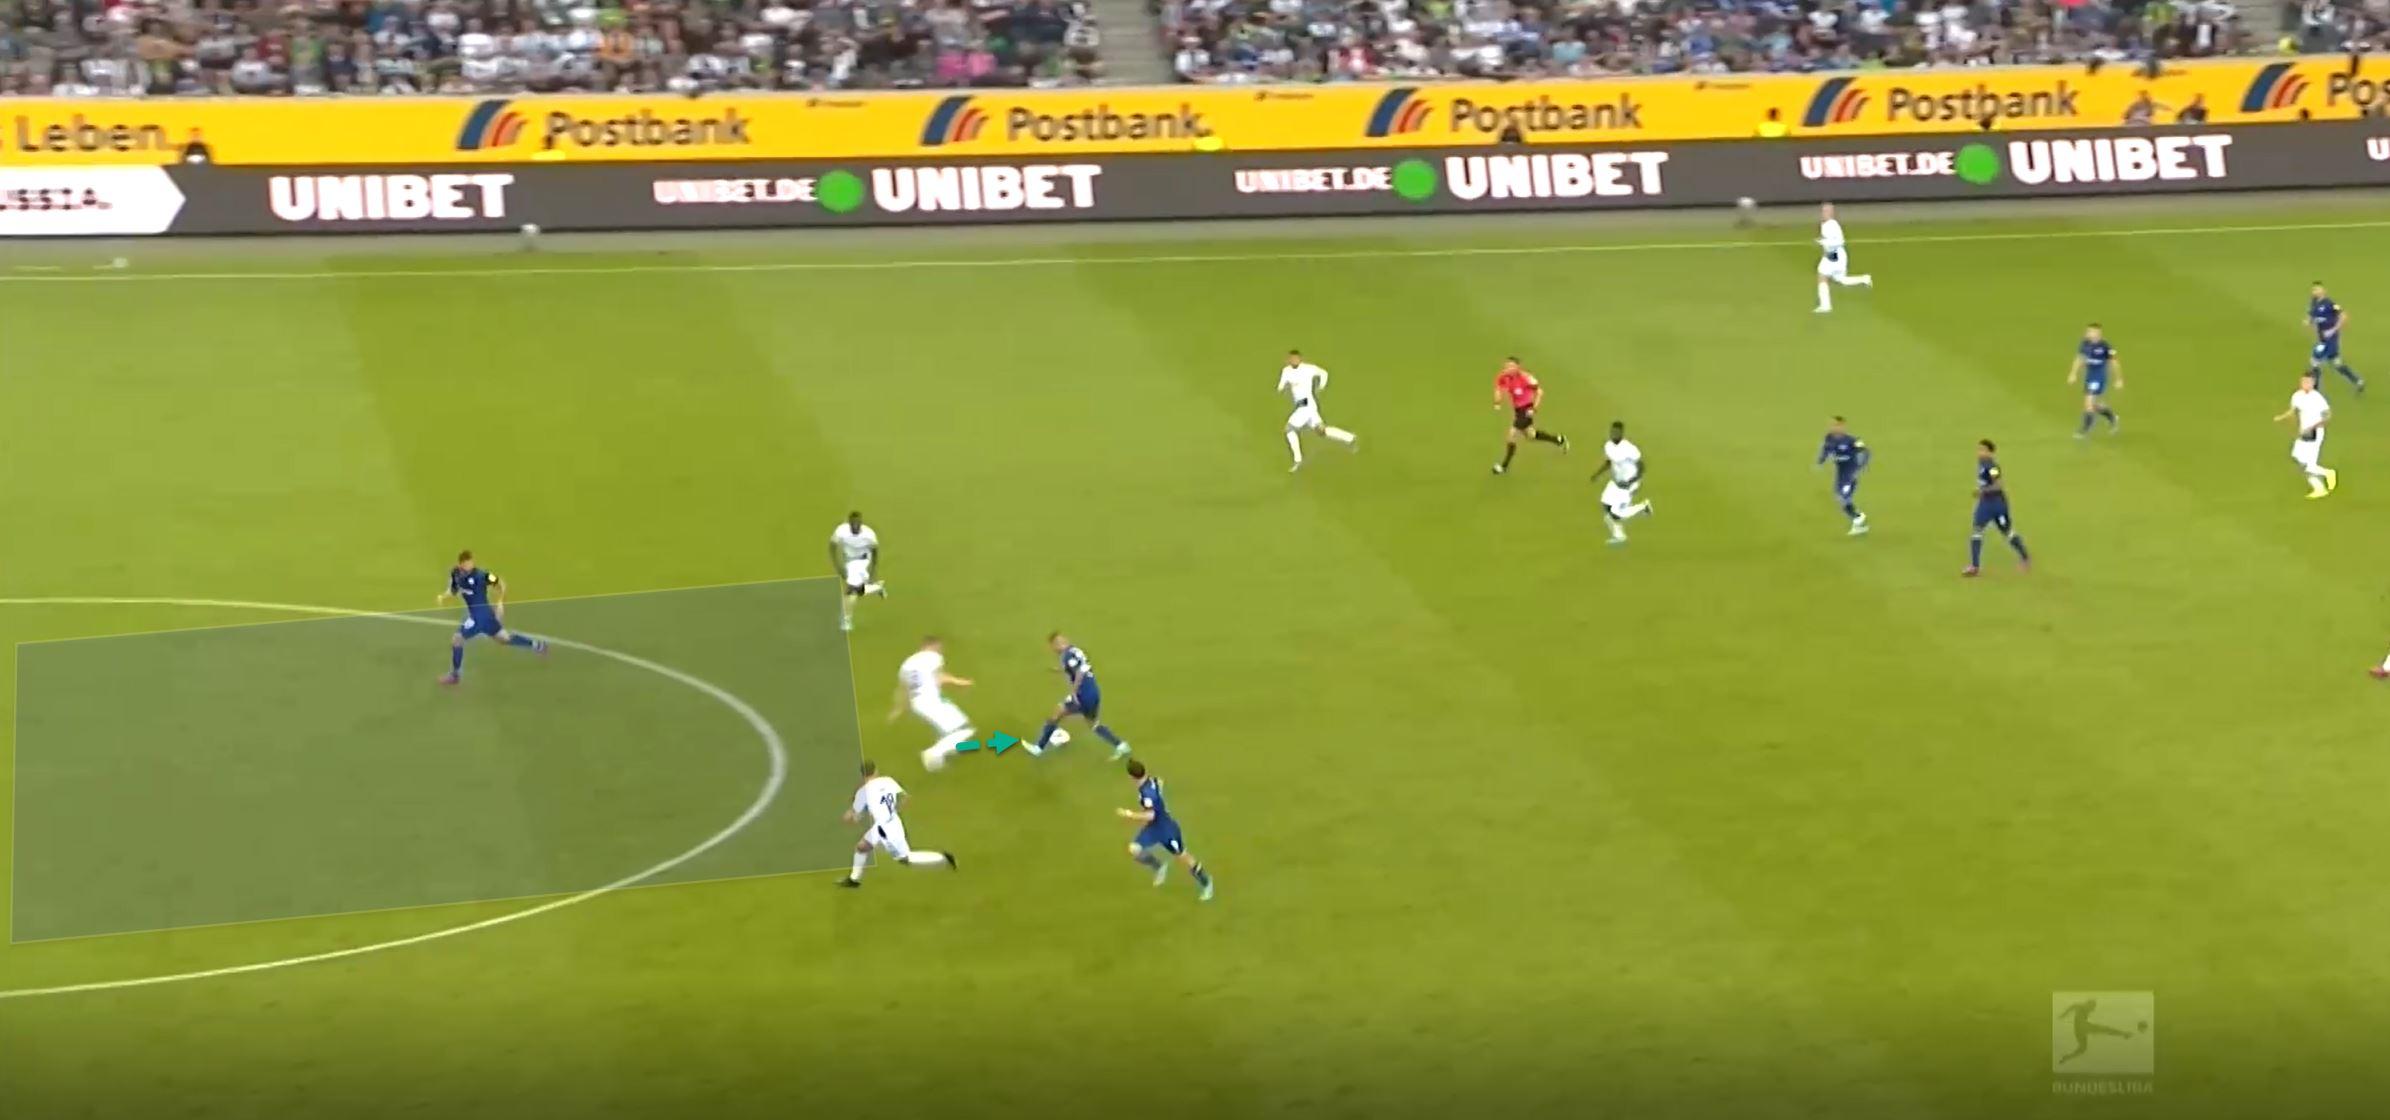 Bundesliga 2019/20: Borussia Monchengladbach vs Schalke- Tactical Analysis tactics